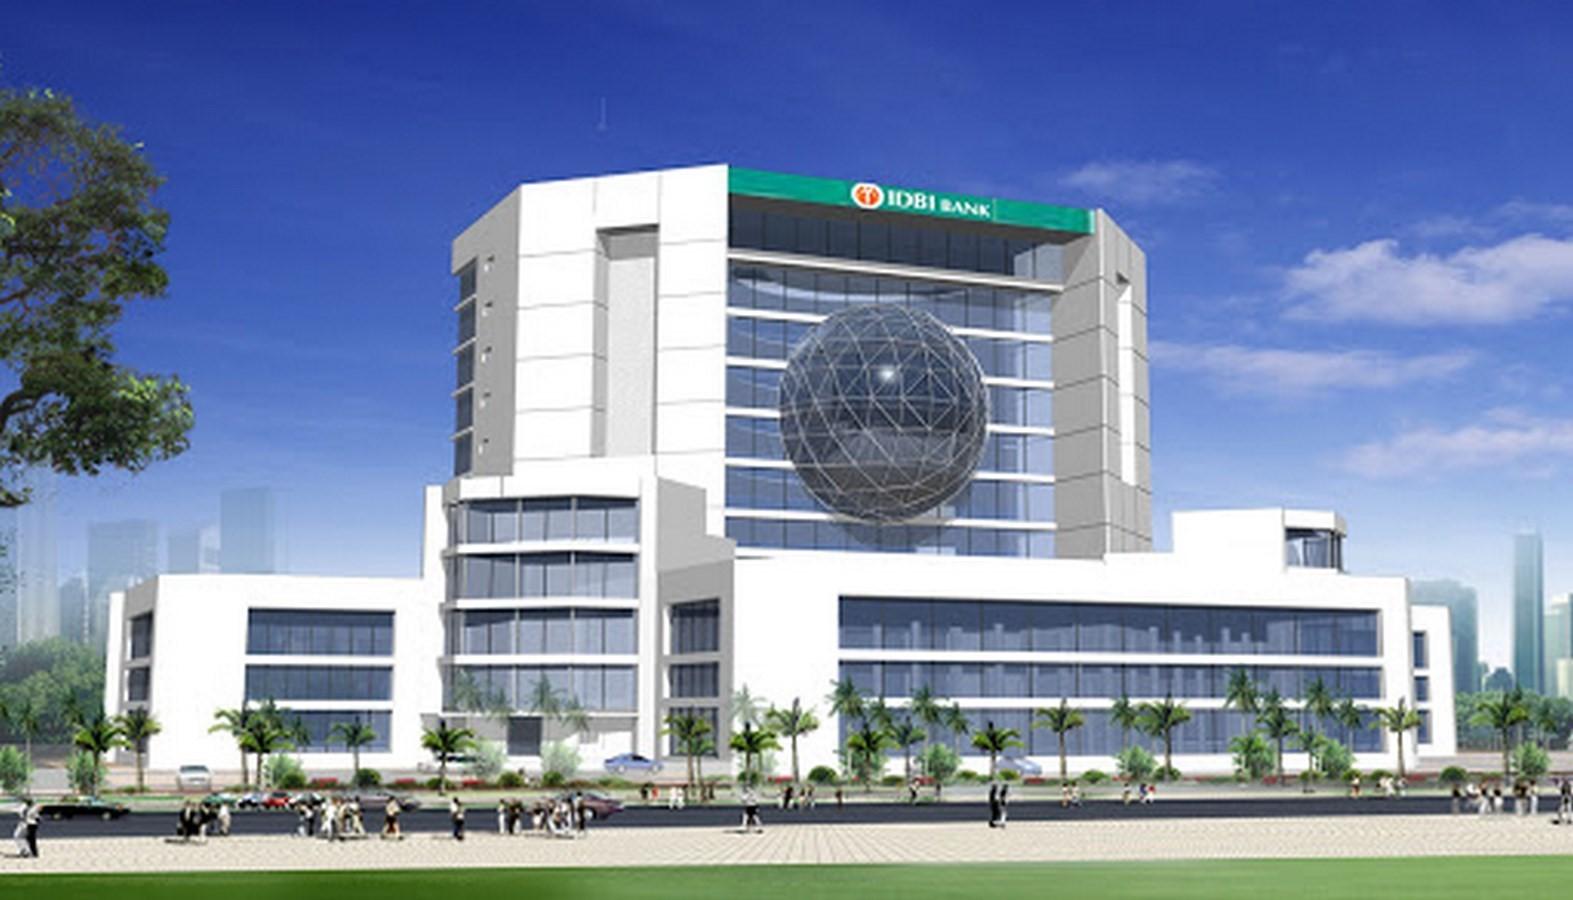 Annex Building for IDBI - Sheet1